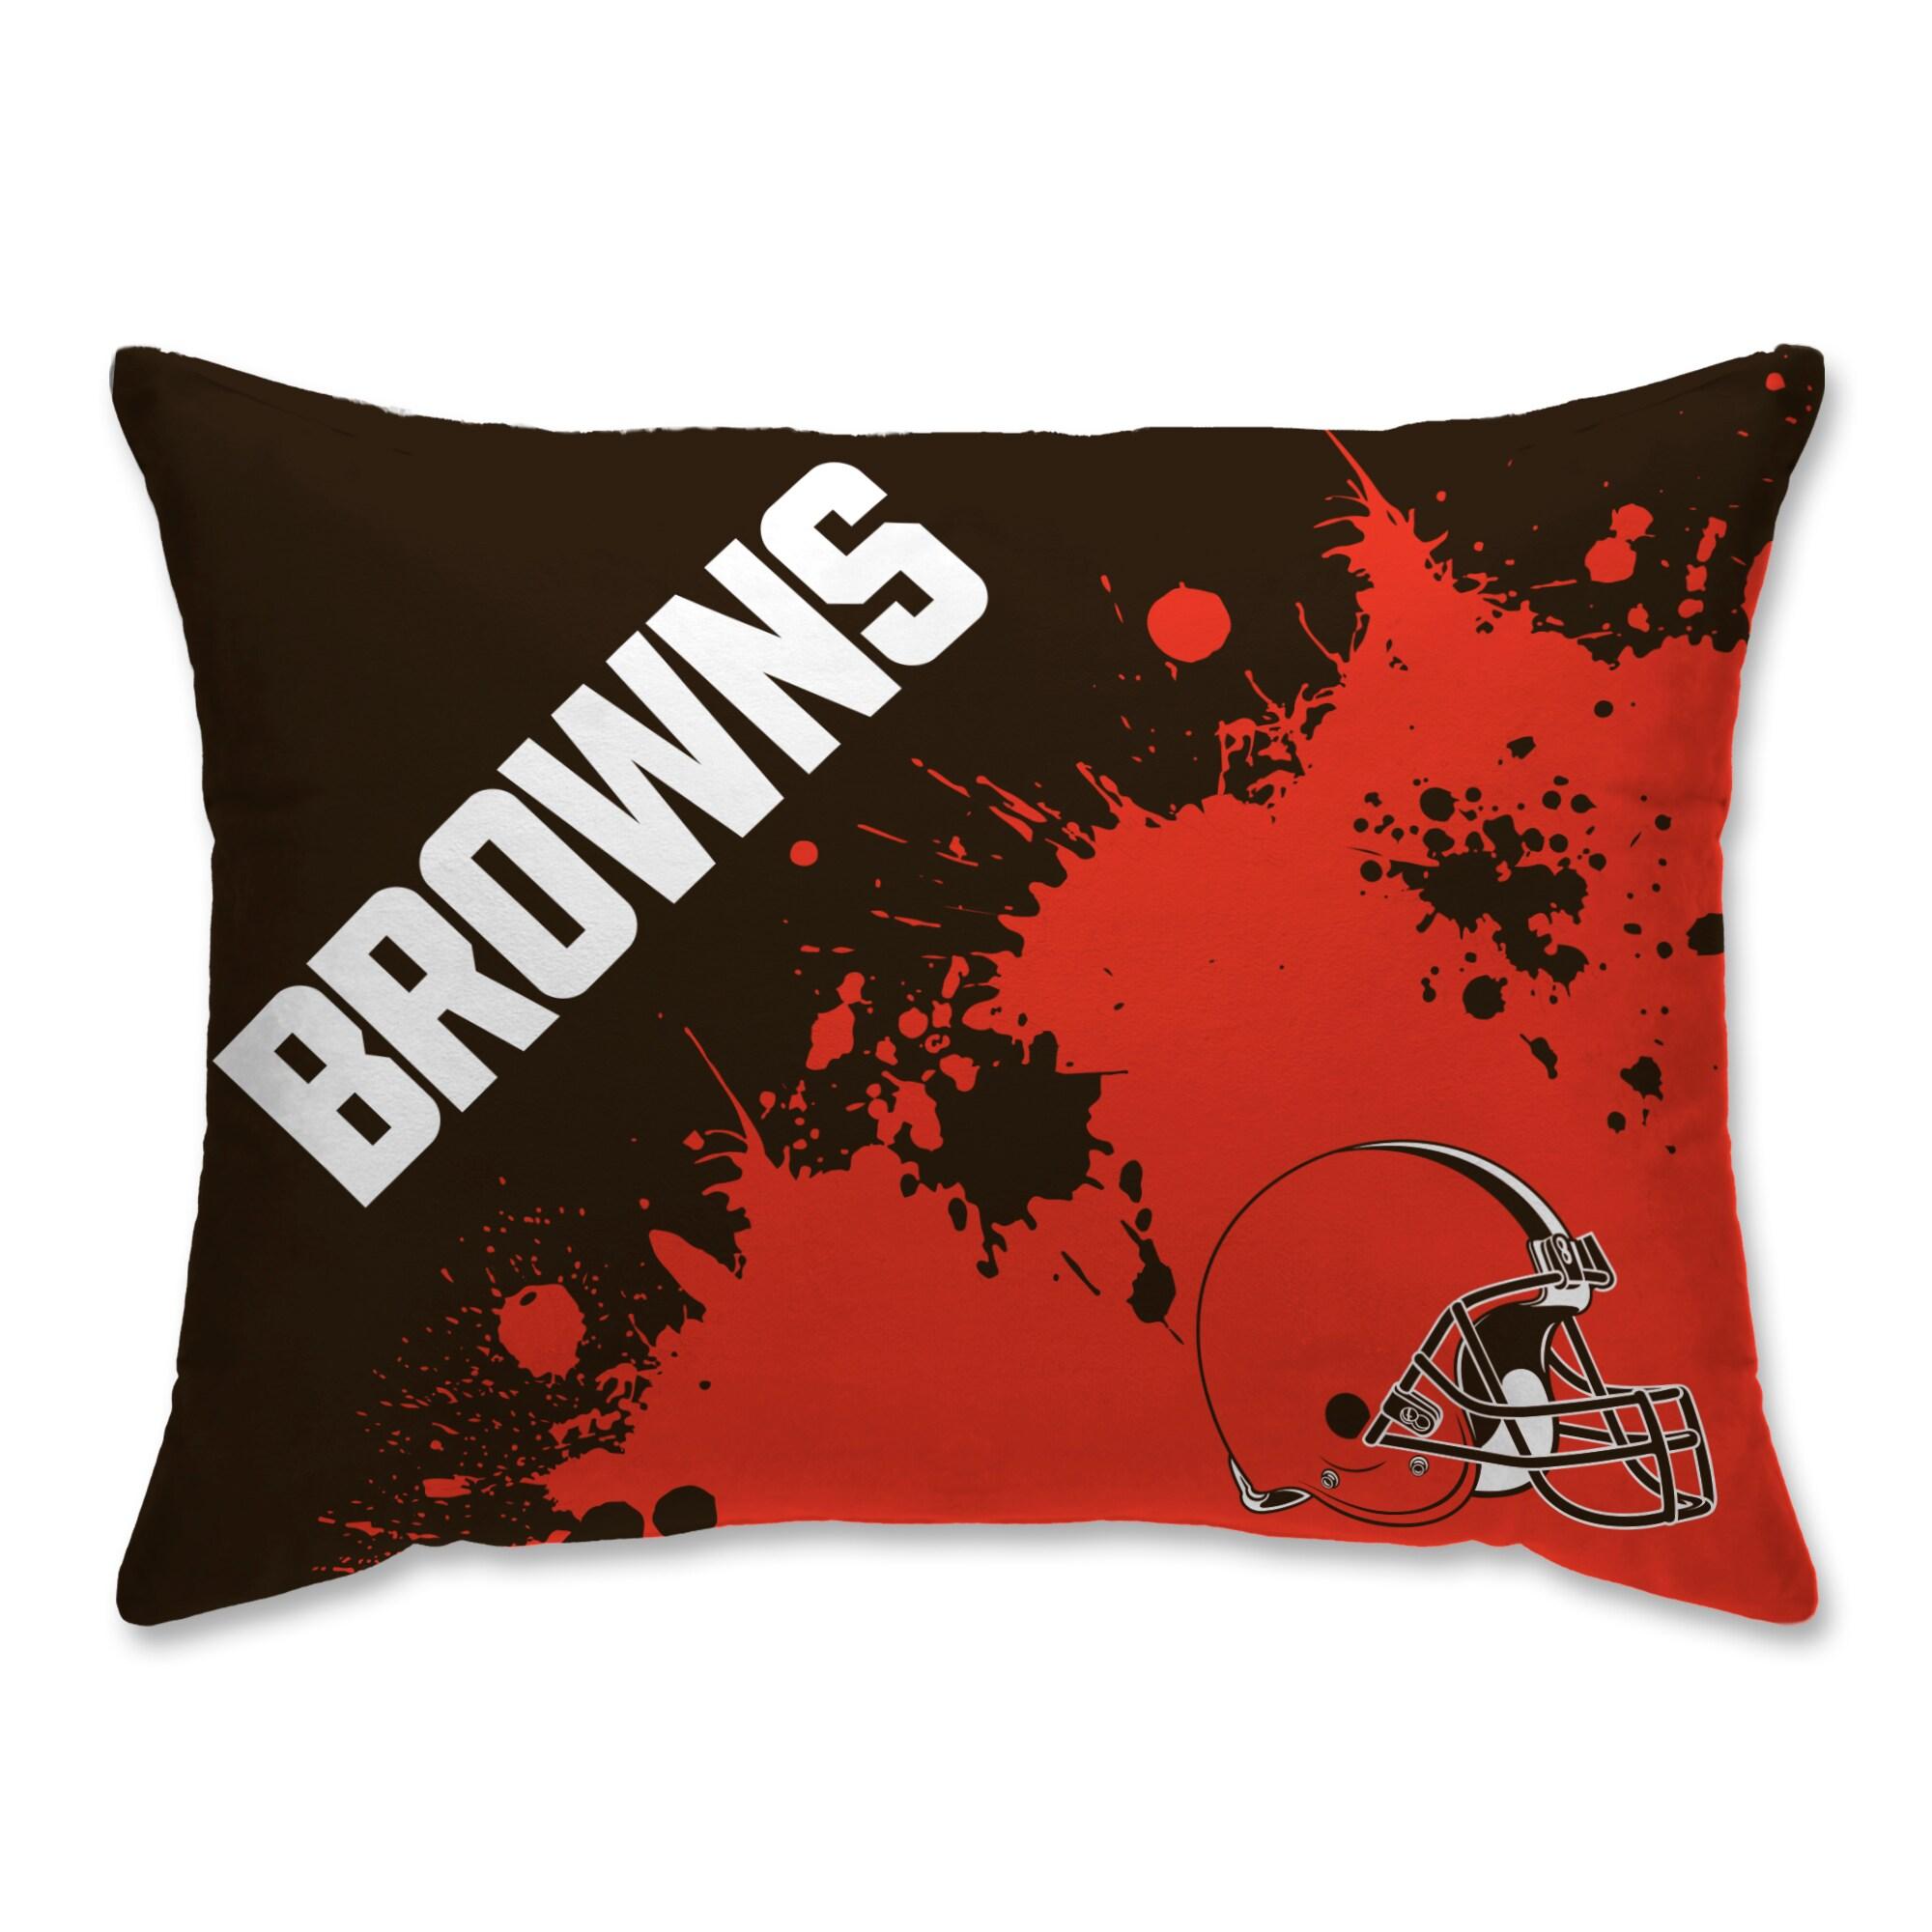 Cleveland Browns Splatter Plush Bed Pillow - Brown